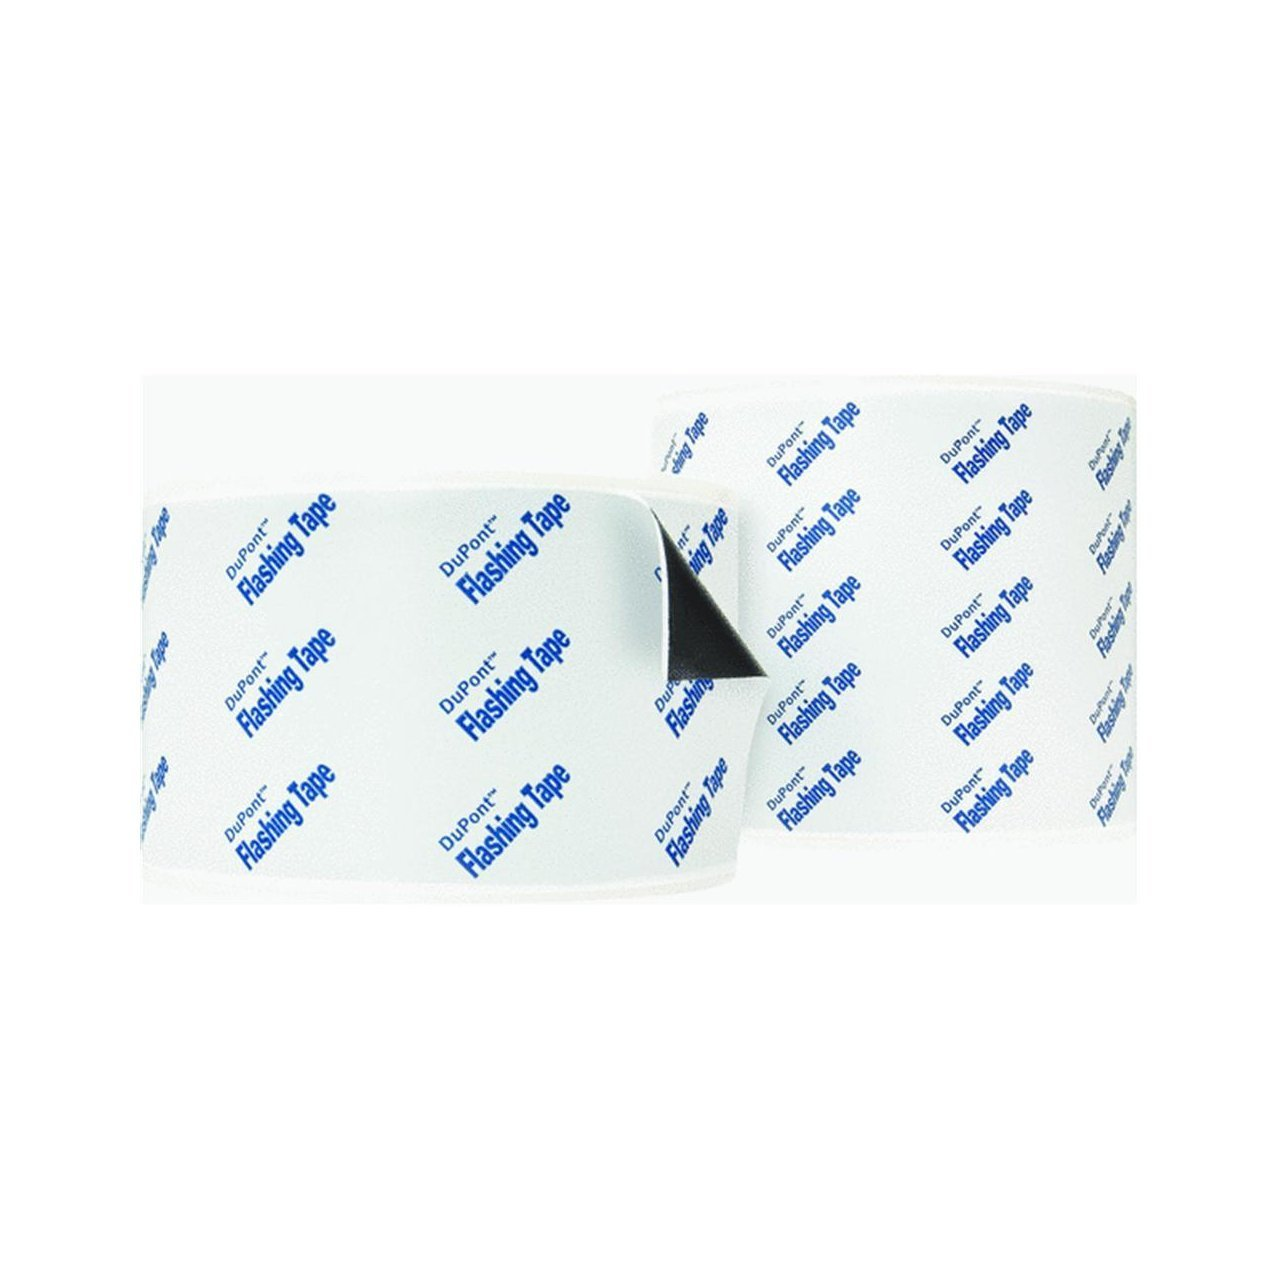 Dupont Tyvek Flashing Tape 4'' x 33' - 1 Roll by DuPont